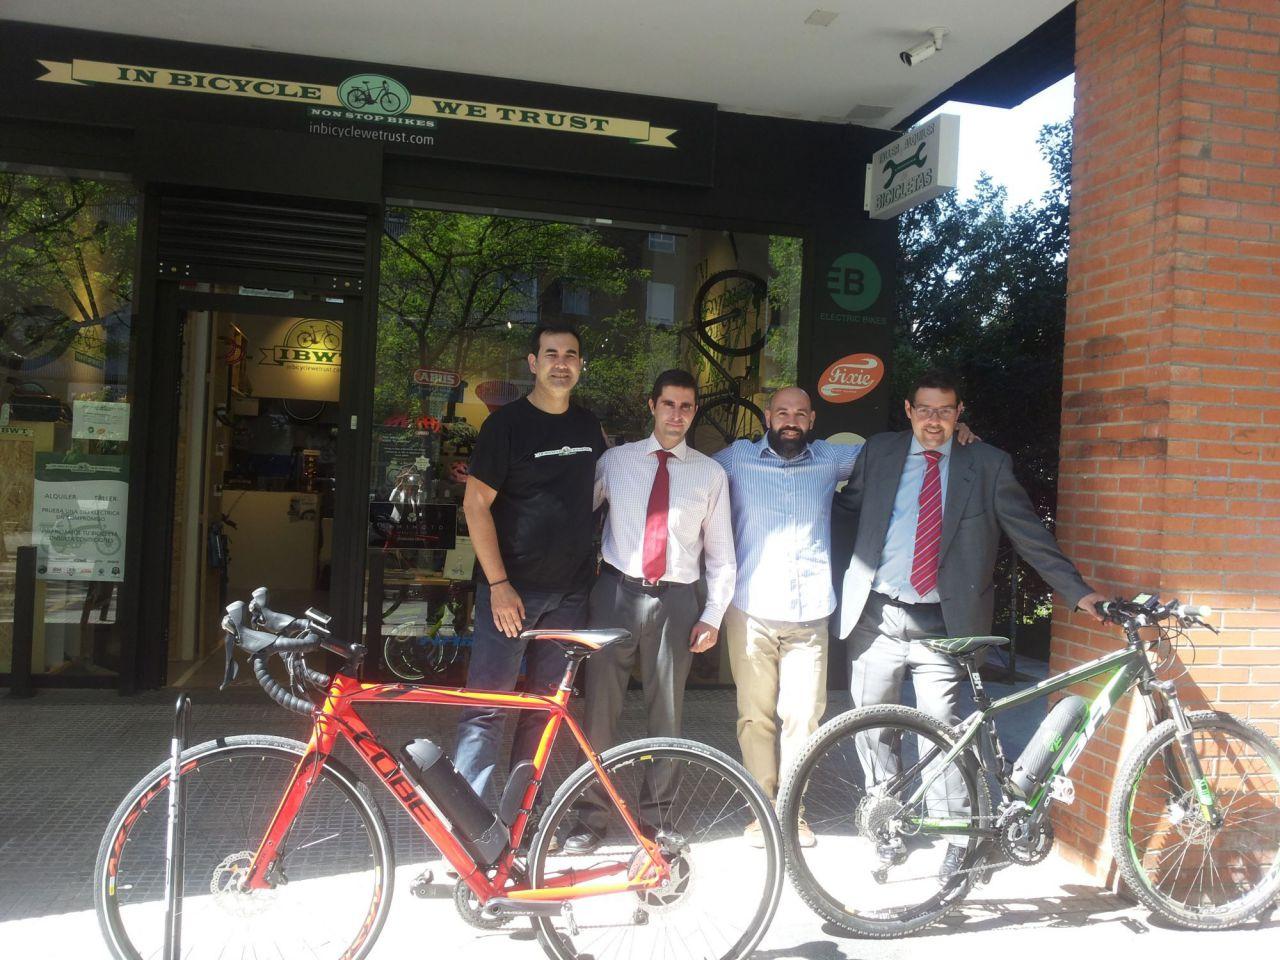 Dos emprendedores españoles diseñan un kit para convertir cualquier bicicleta tradicional en eléctrica